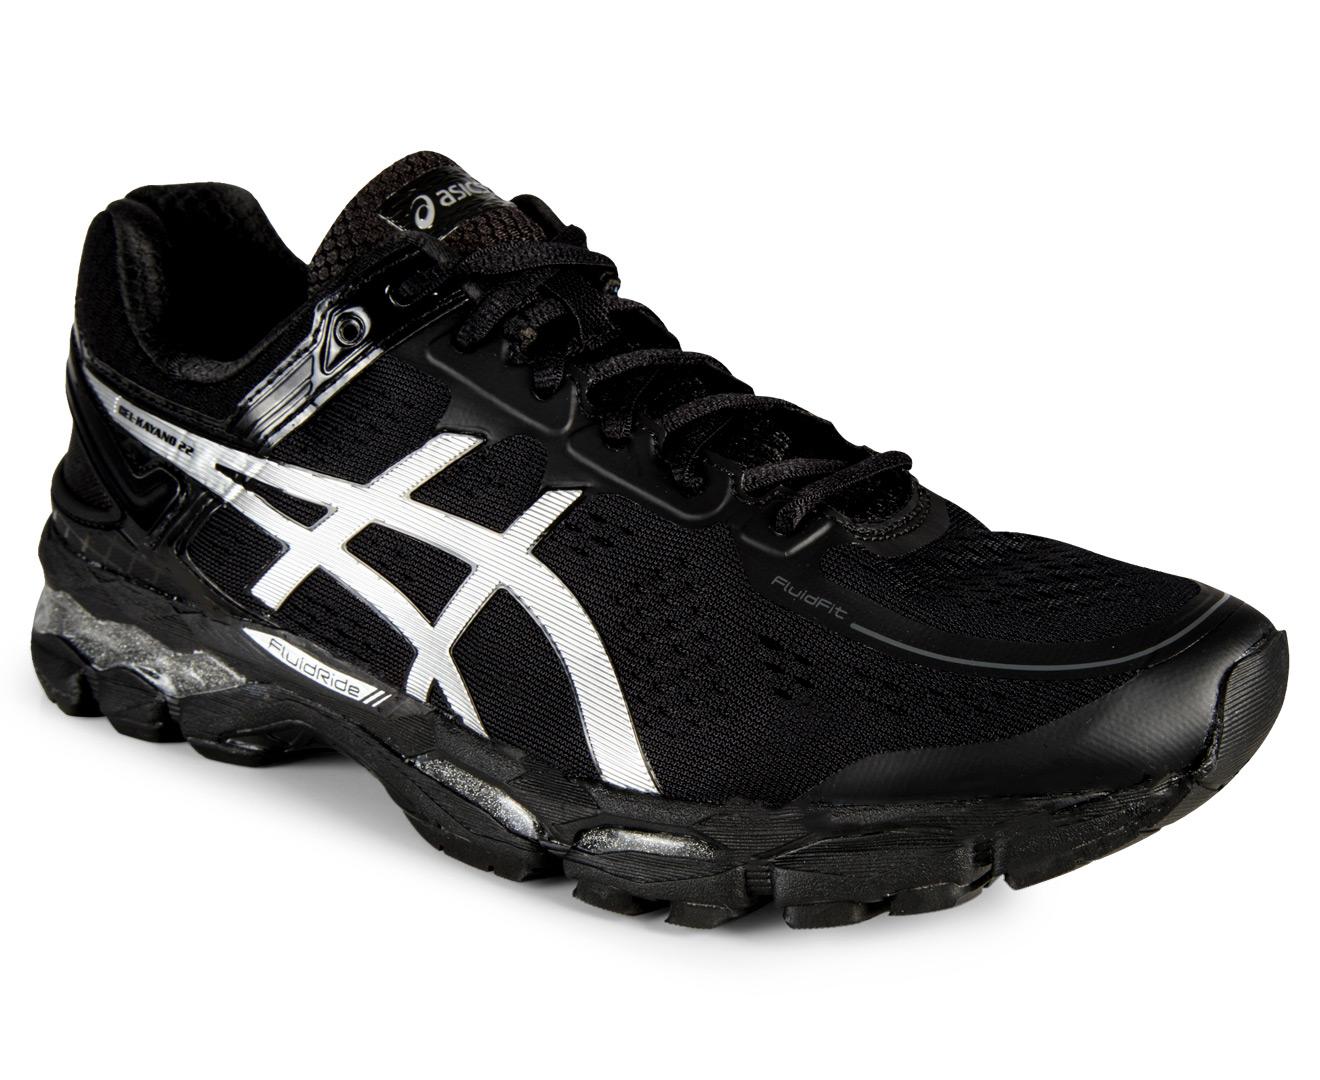 Buy asics gel kayano 22 mens shoes onyxsilvercharcoal